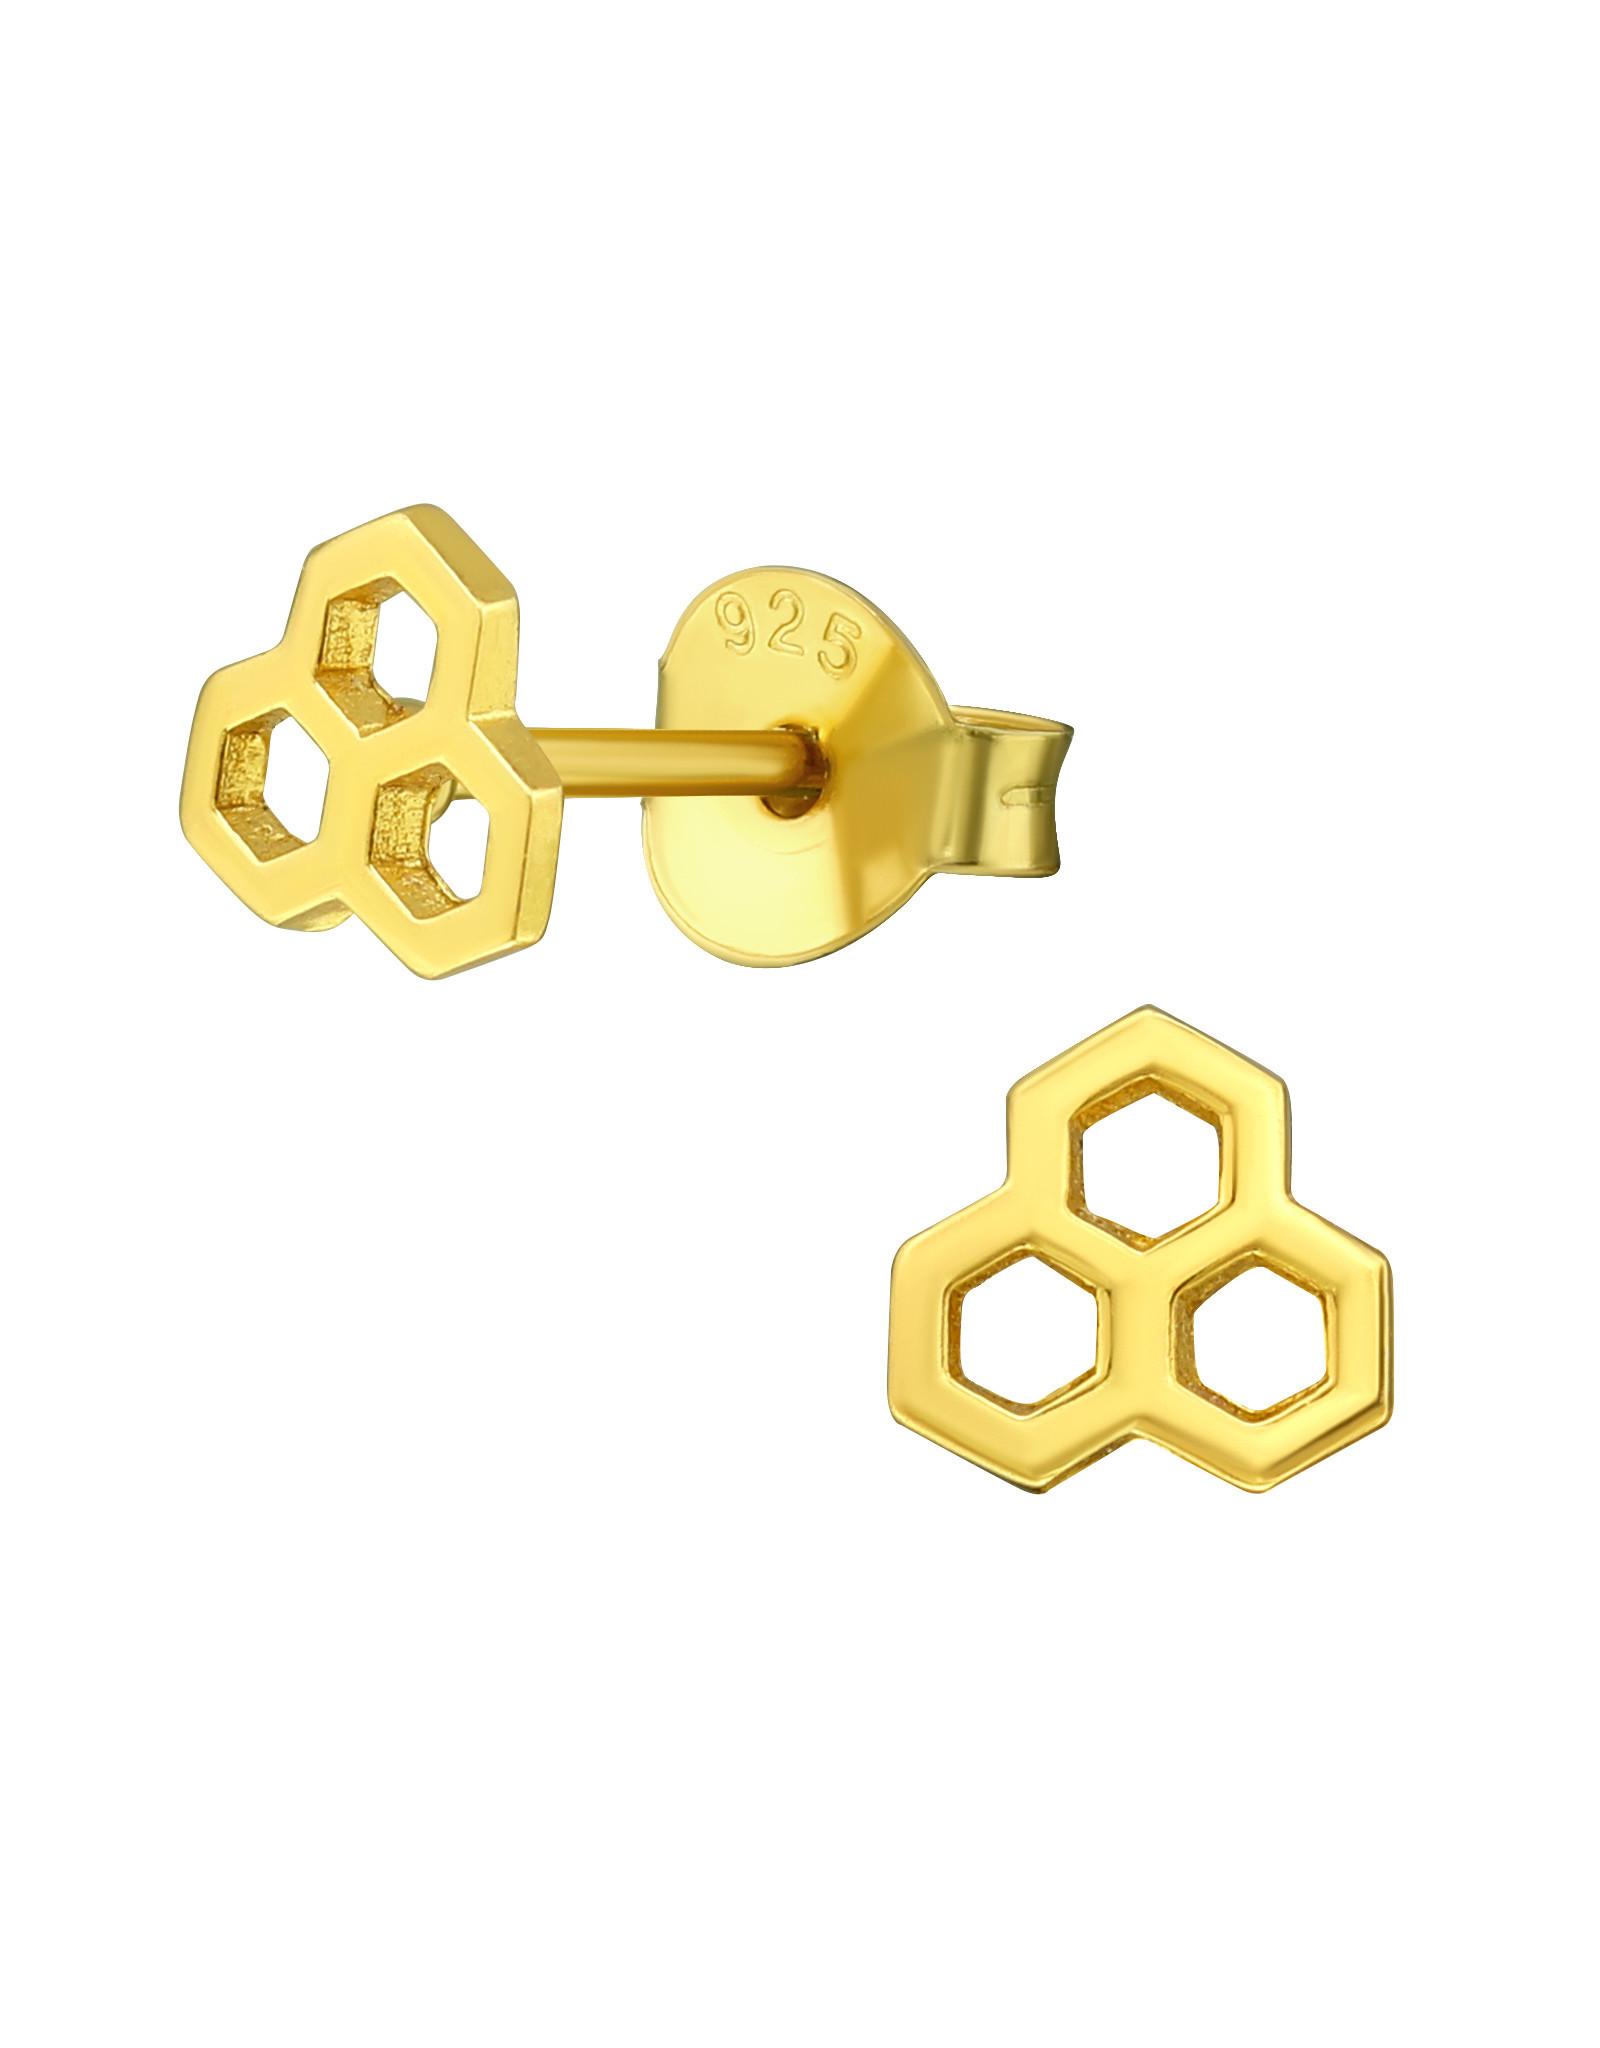 Stekertjes zilver verguld honingraat mini